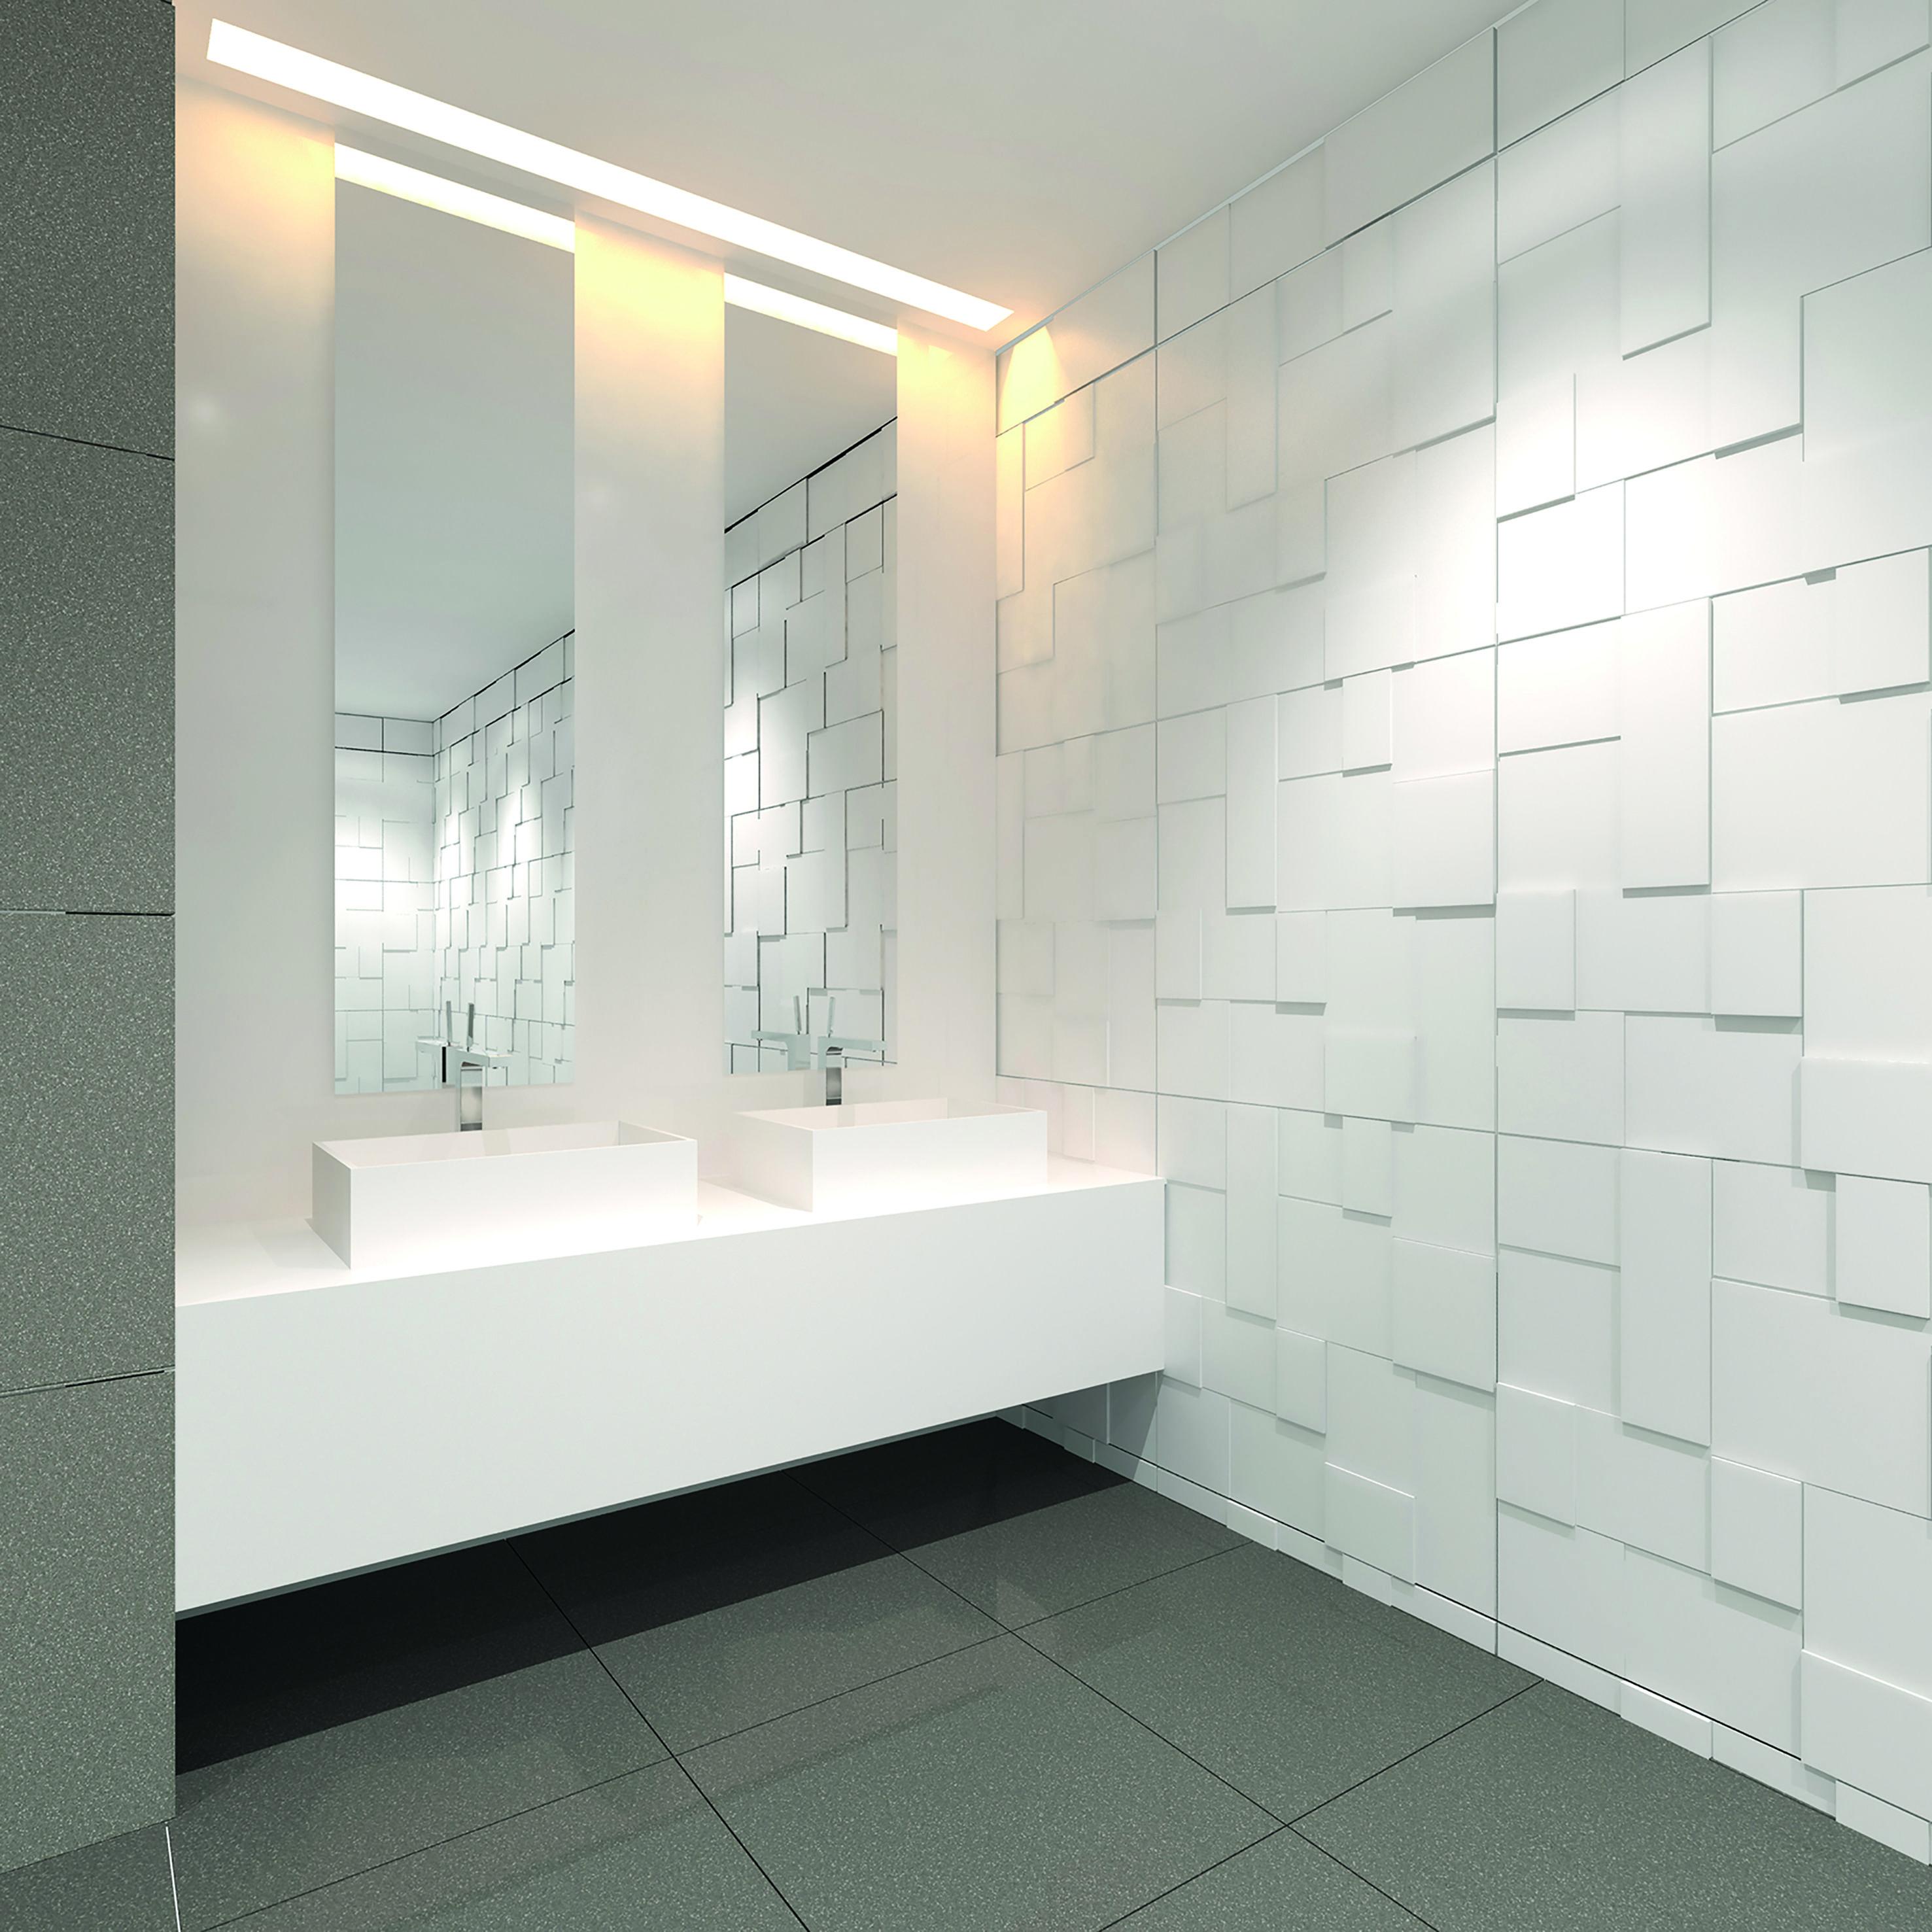 BURGMANS® Puurwit solid surface wastafels | Wastafels badkamer ...